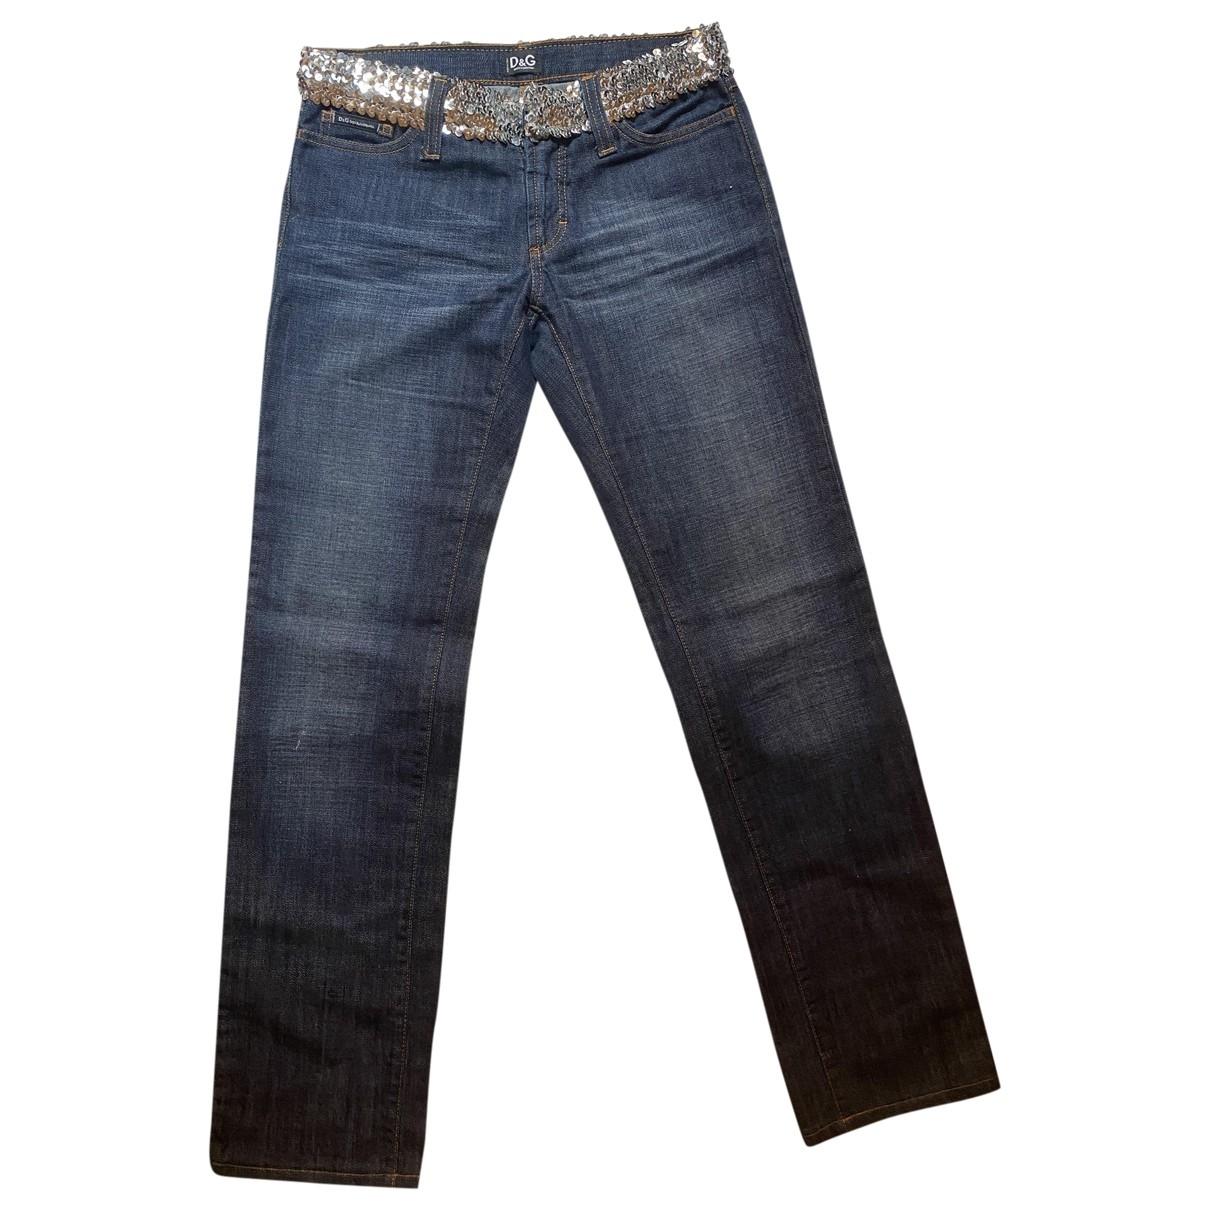 D&g \N Blue Denim - Jeans Jeans for Women 36 FR